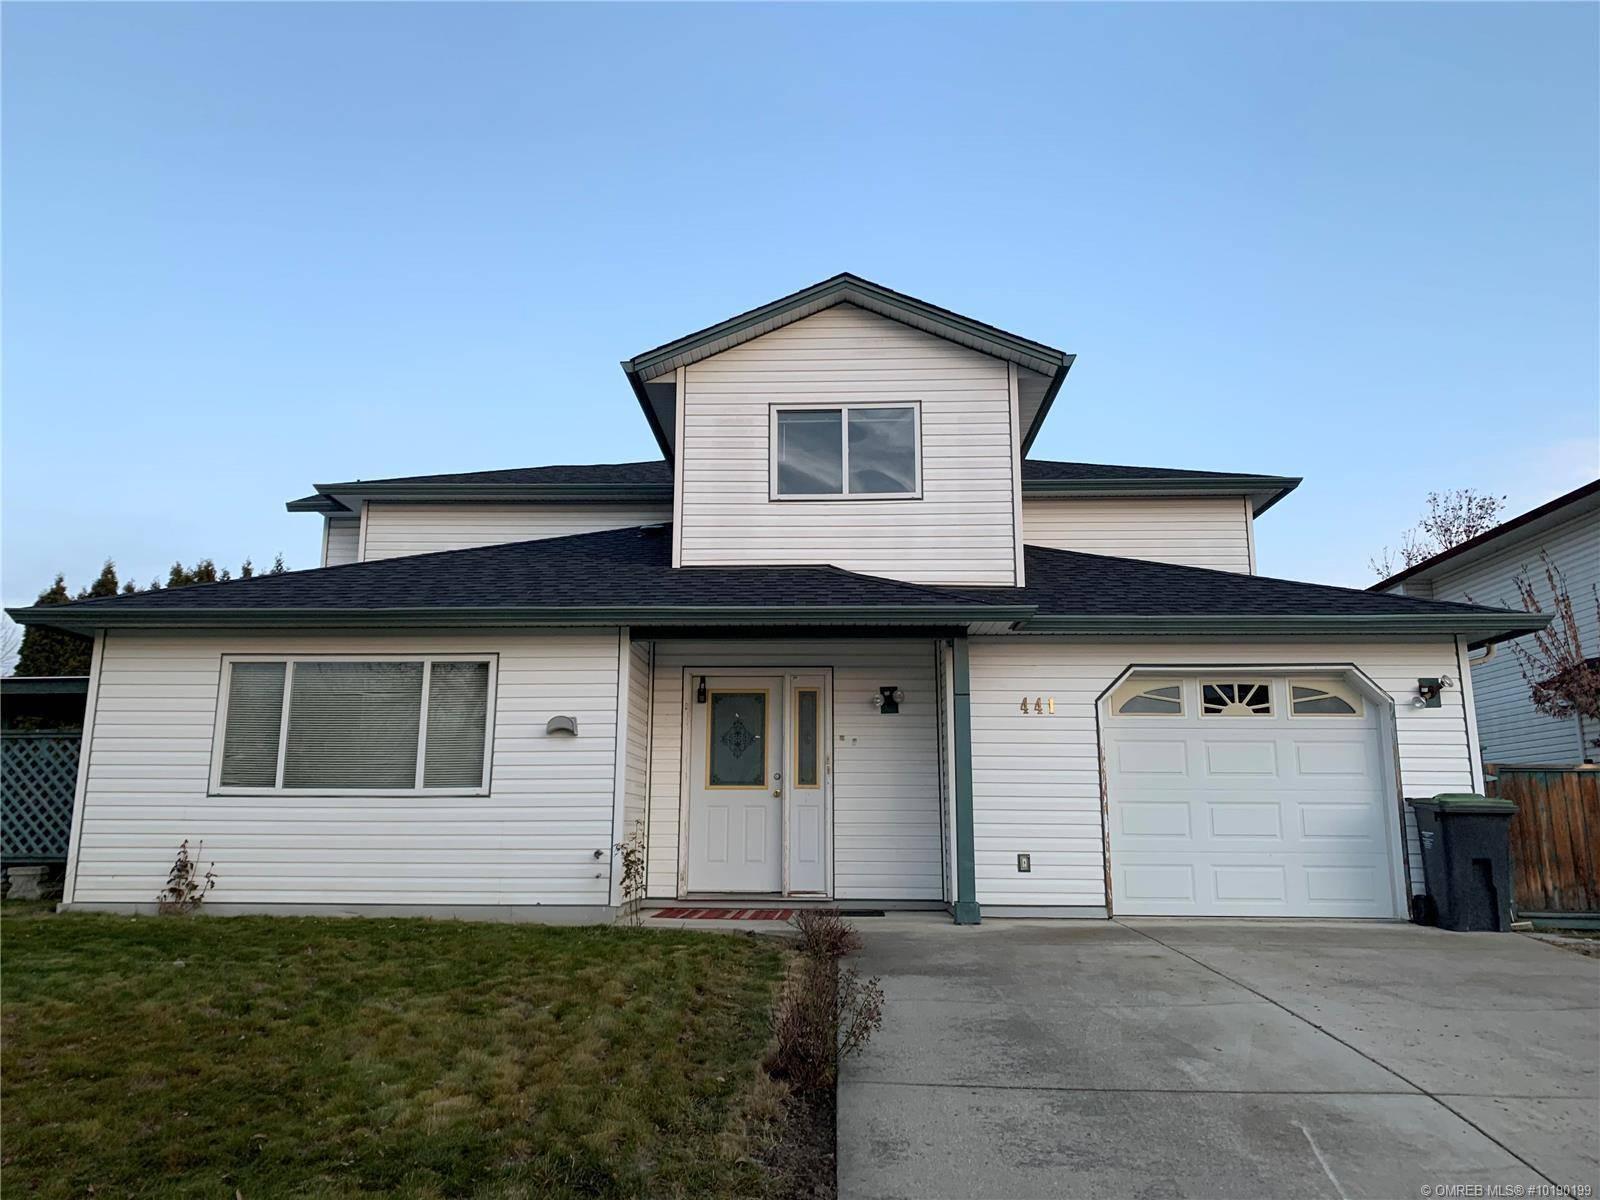 Townhouse for sale at 441 Murray Cres Kelowna British Columbia - MLS: 10190199